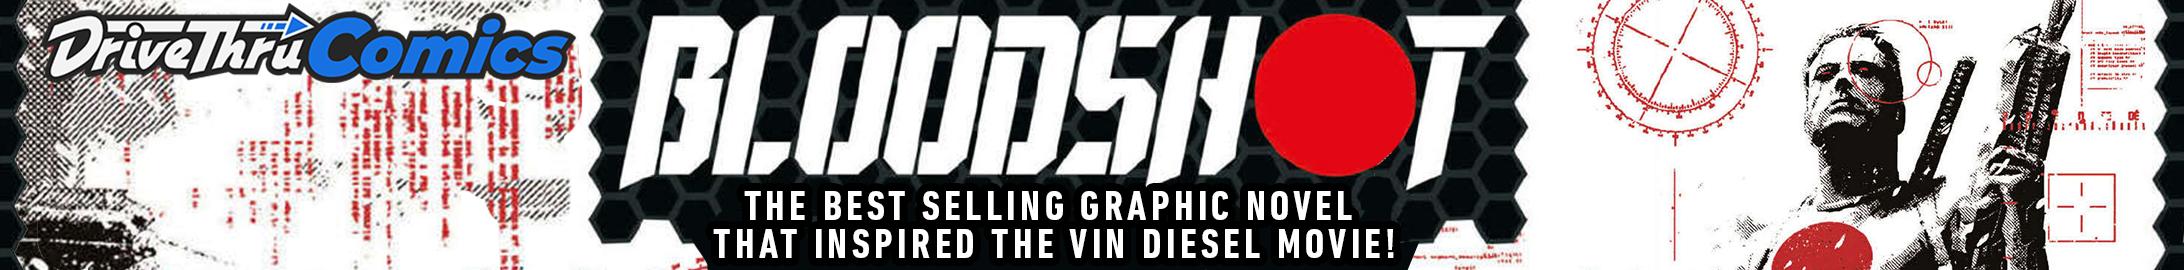 Bloodshot Definitive Edition @ DriveThruComics.com